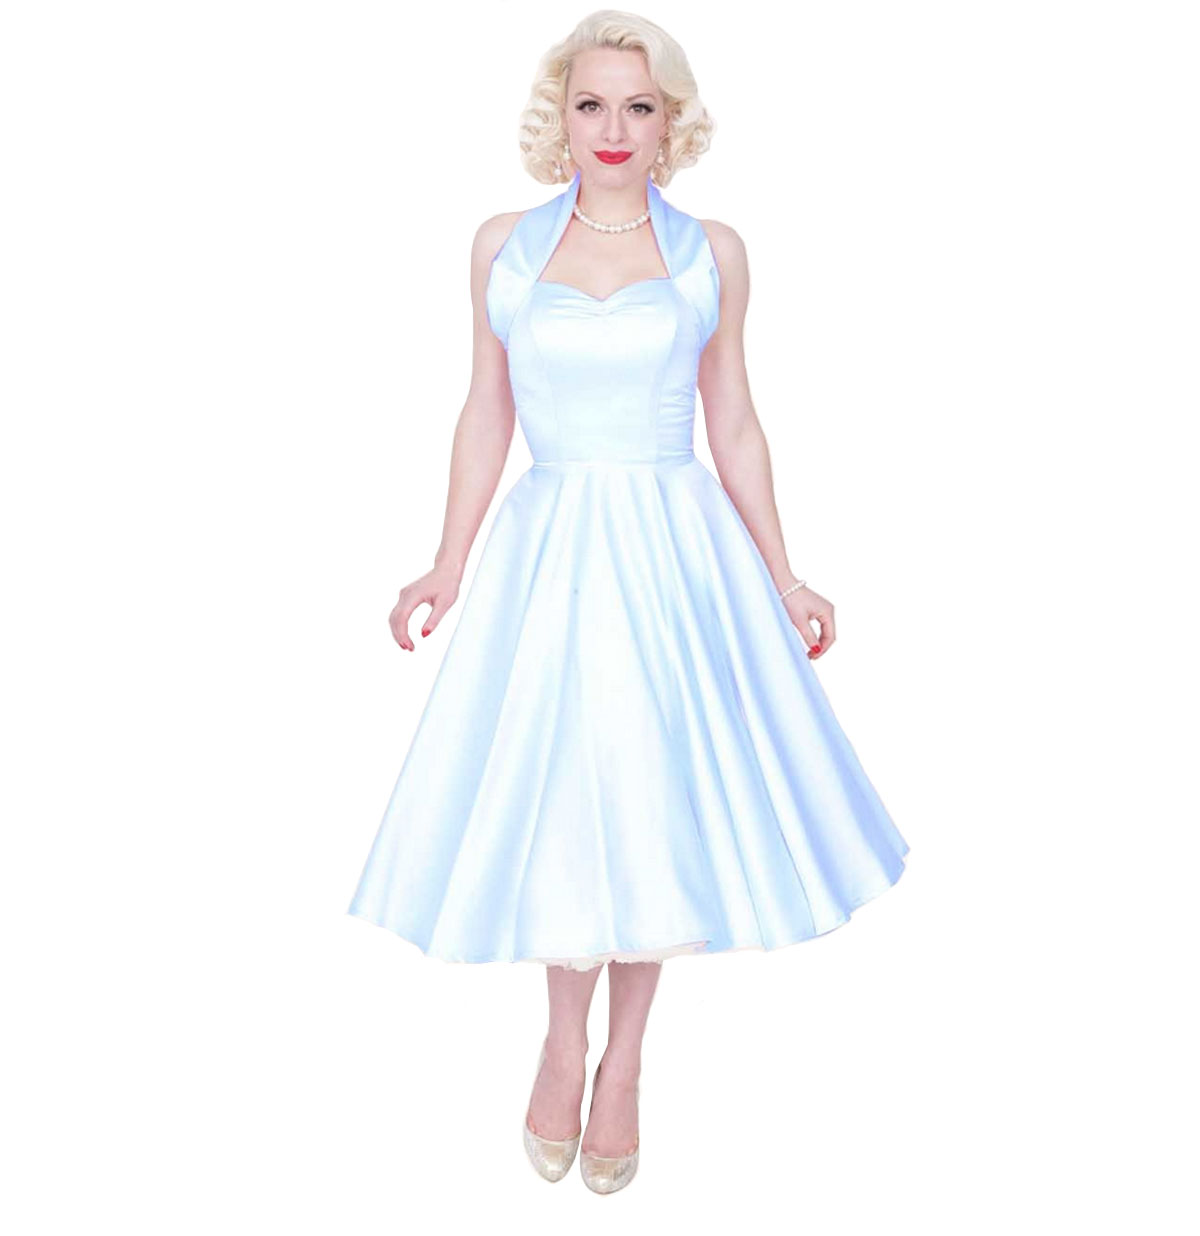 Duchess Satin Dress Pale Blue